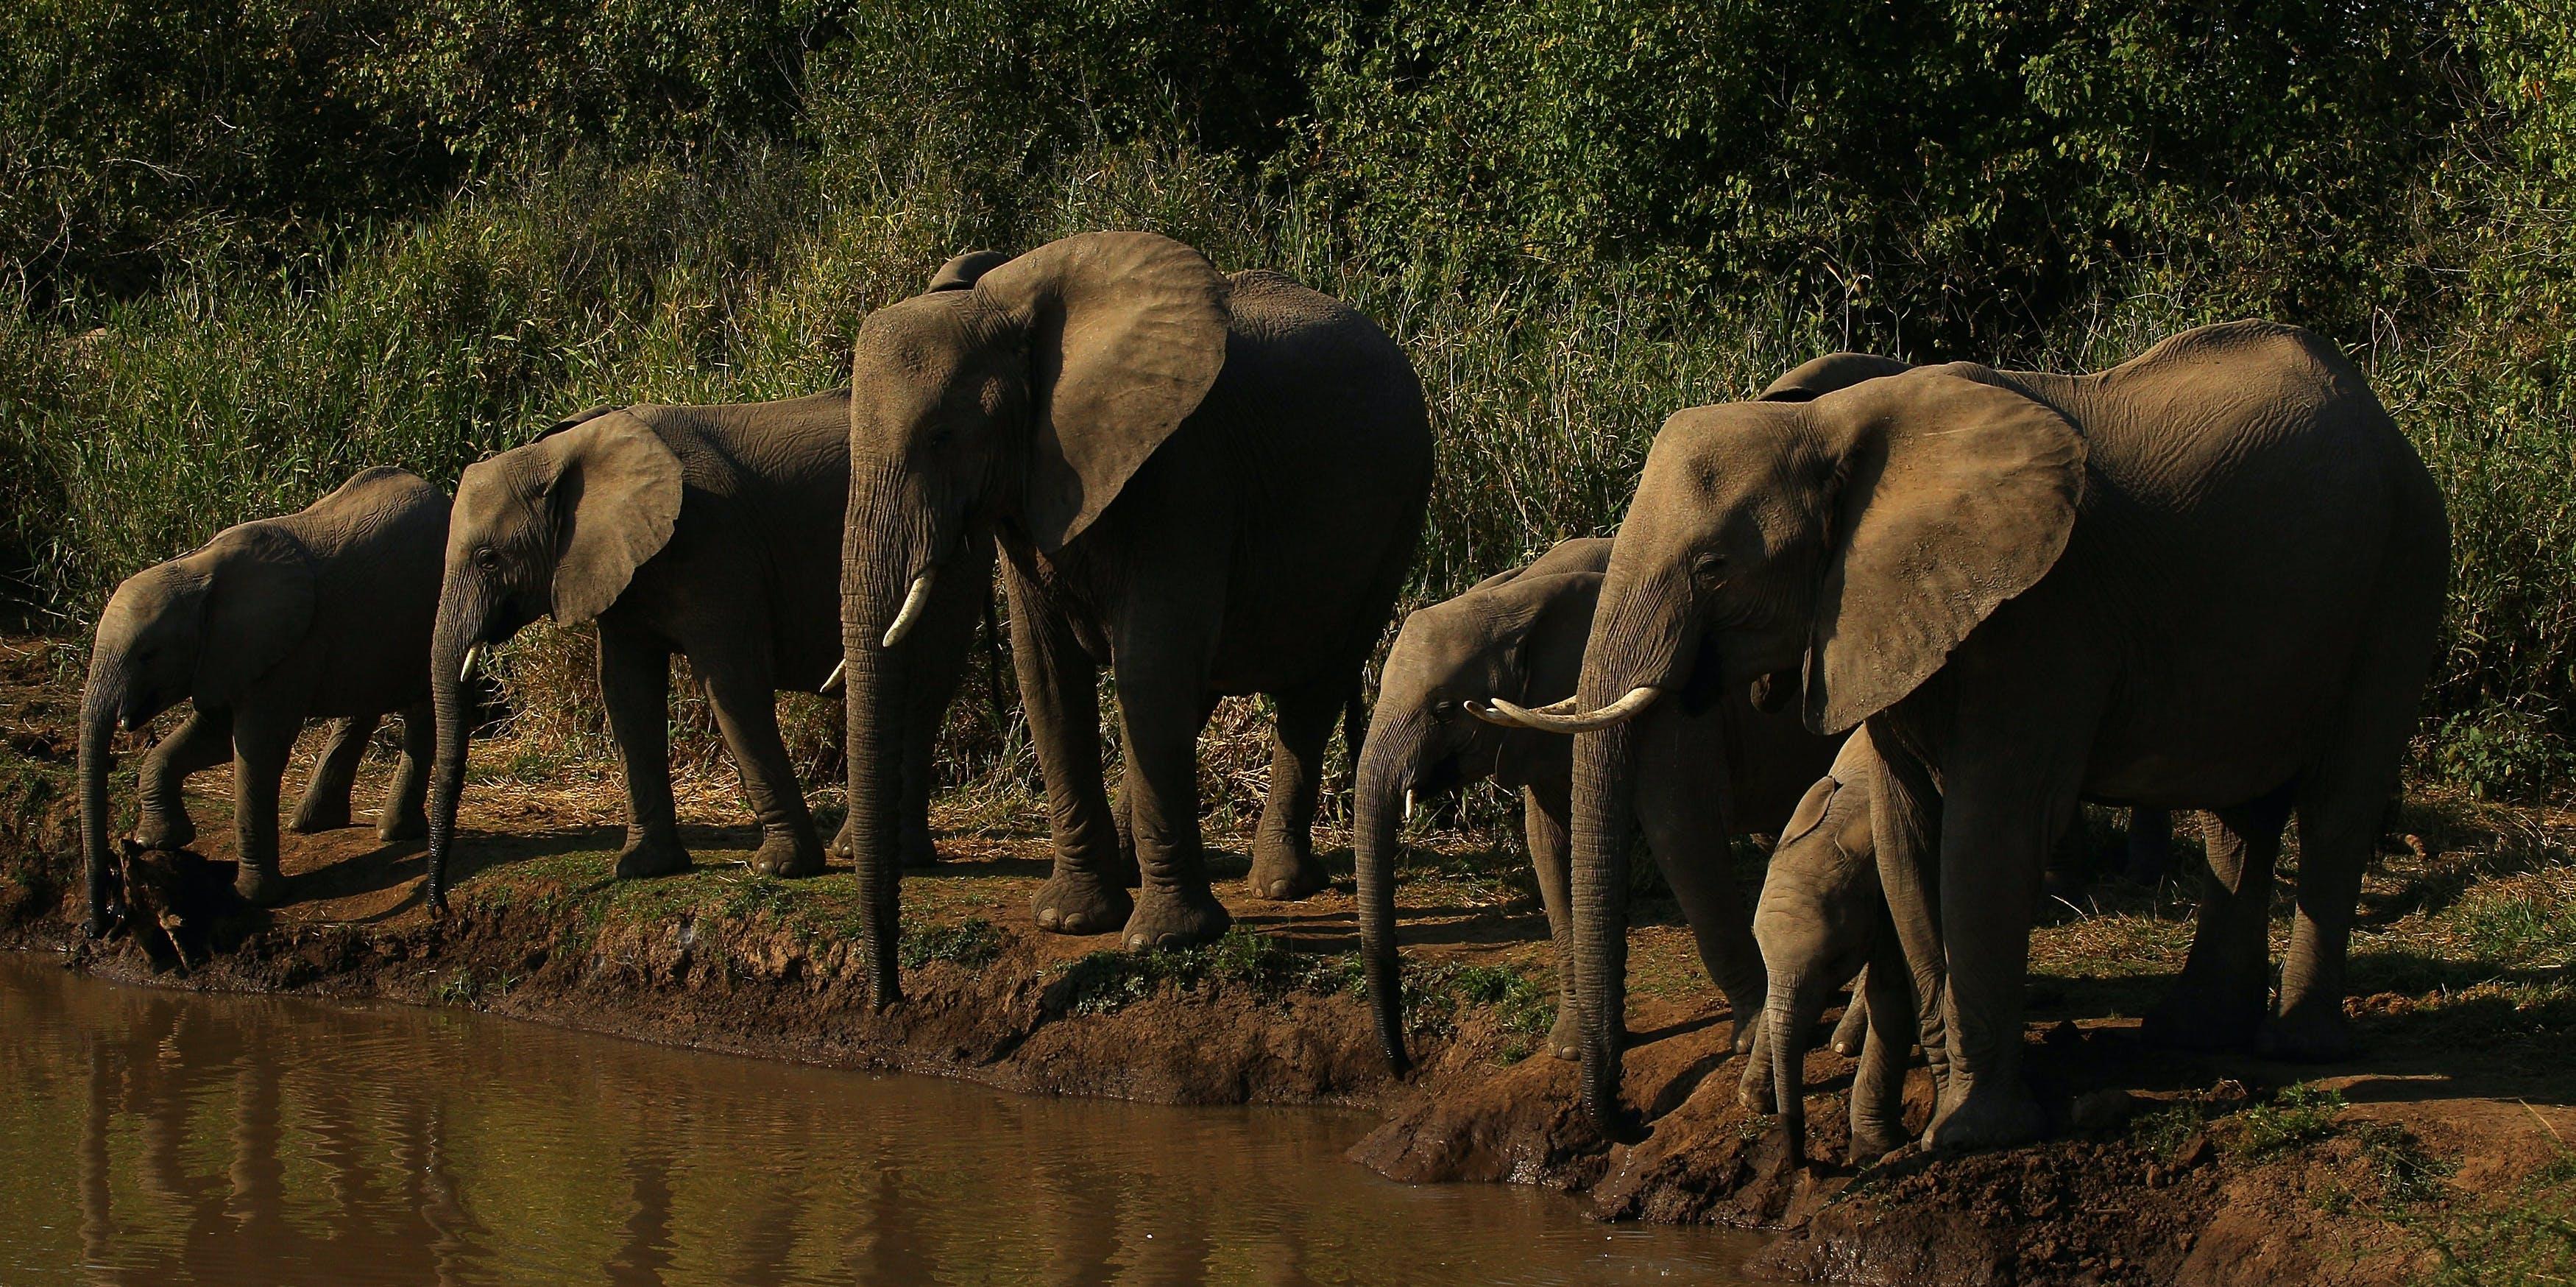 Elephants sleep the least of any mammal we know of.